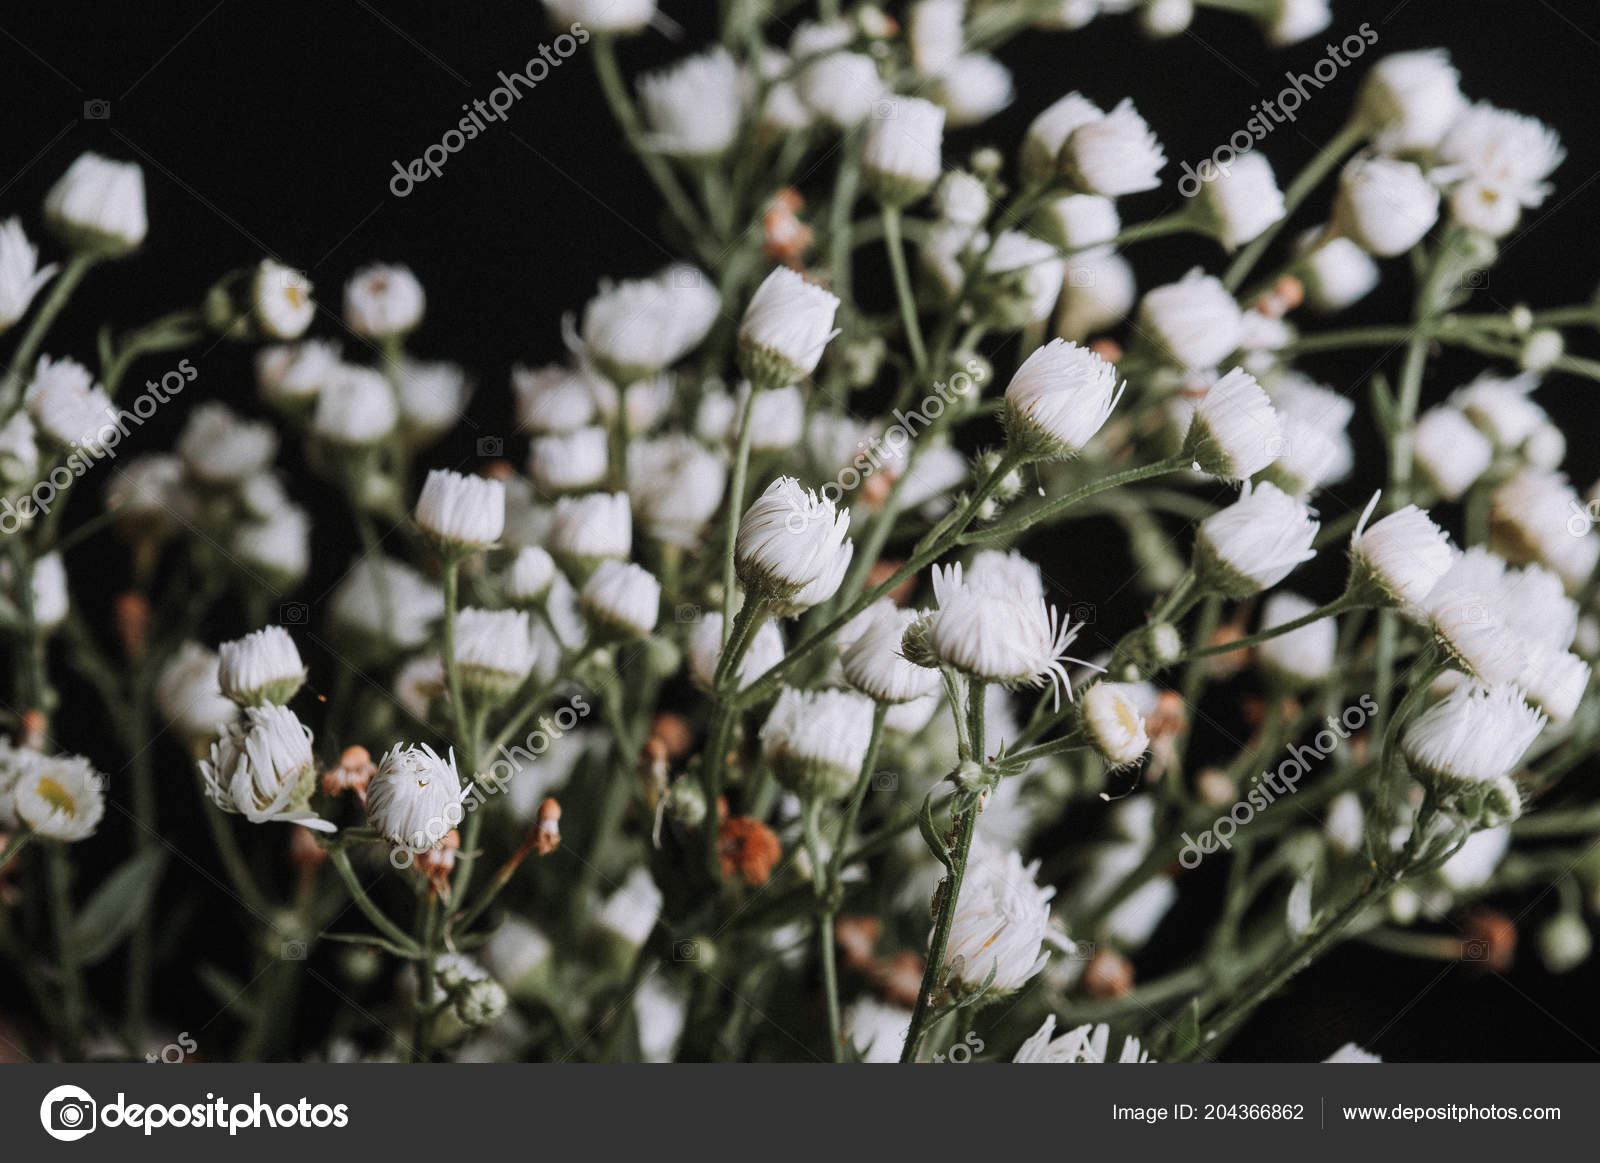 Dried Flowers White Gypsophila Stock Photo Artkvitka 204366862